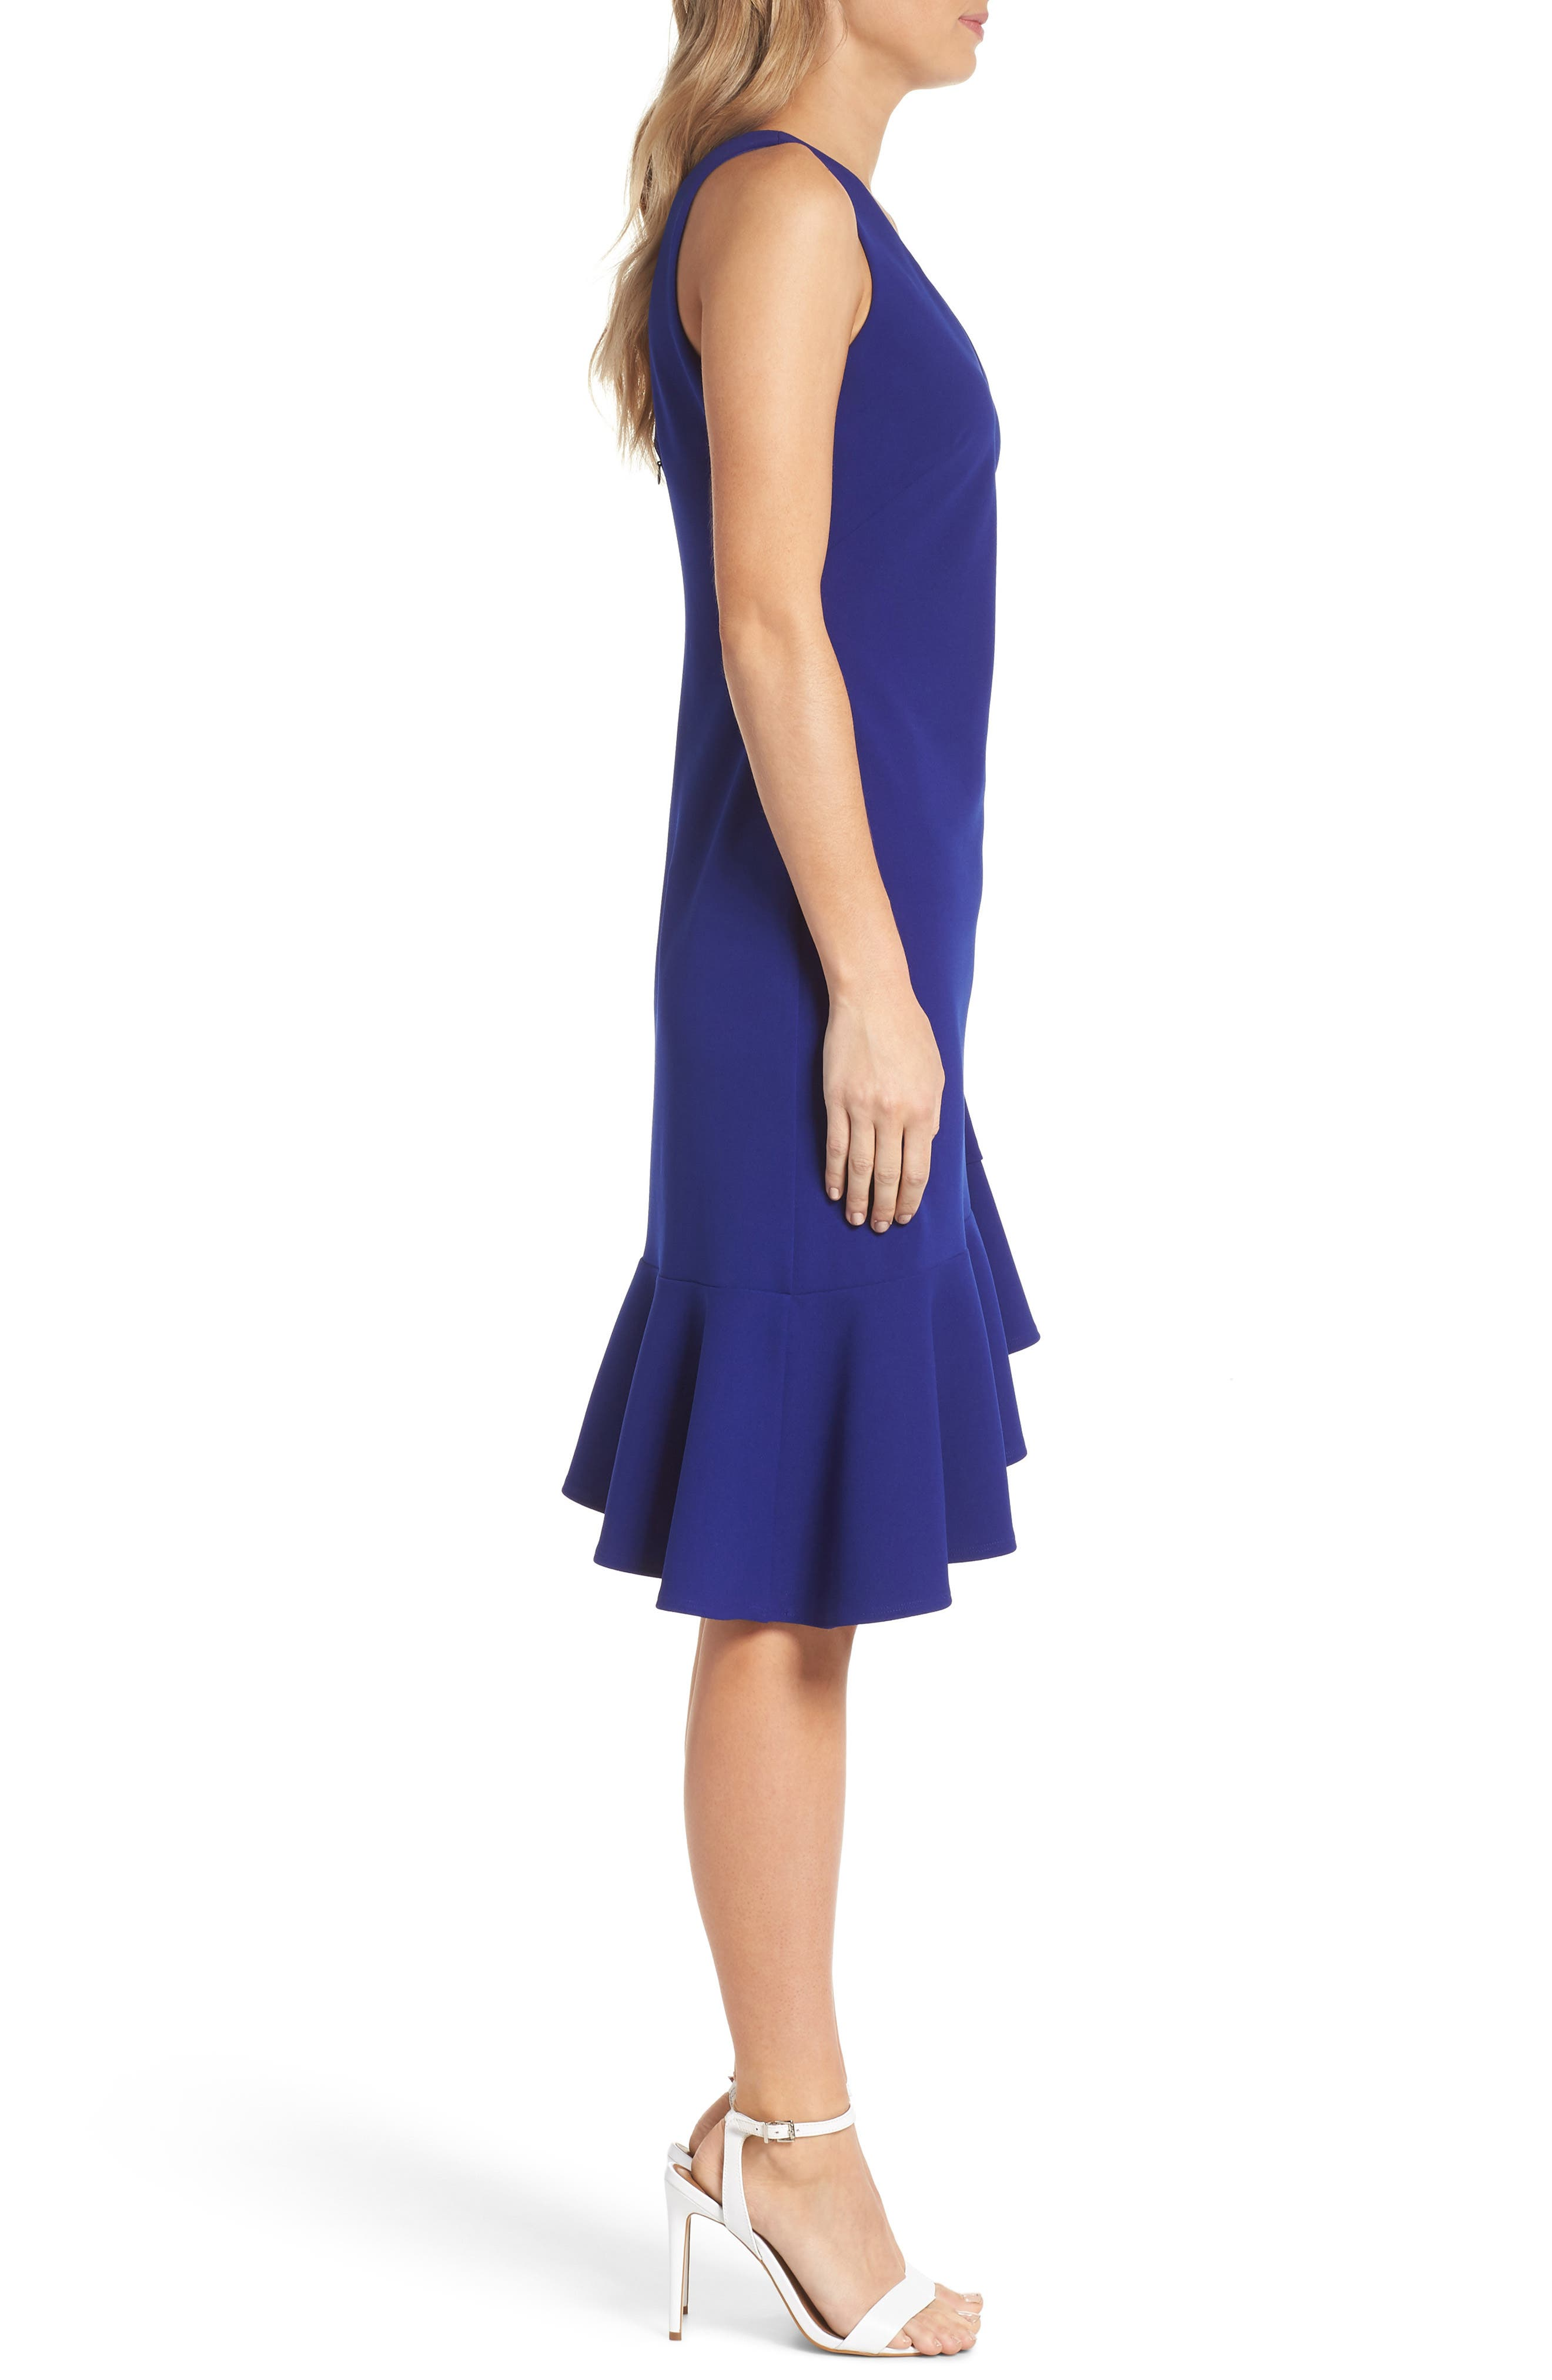 VINCE CAMUTO,                             Asymmetrical Ruffle Hem Scuba Crepe Dress,                             Alternate thumbnail 3, color,                             430